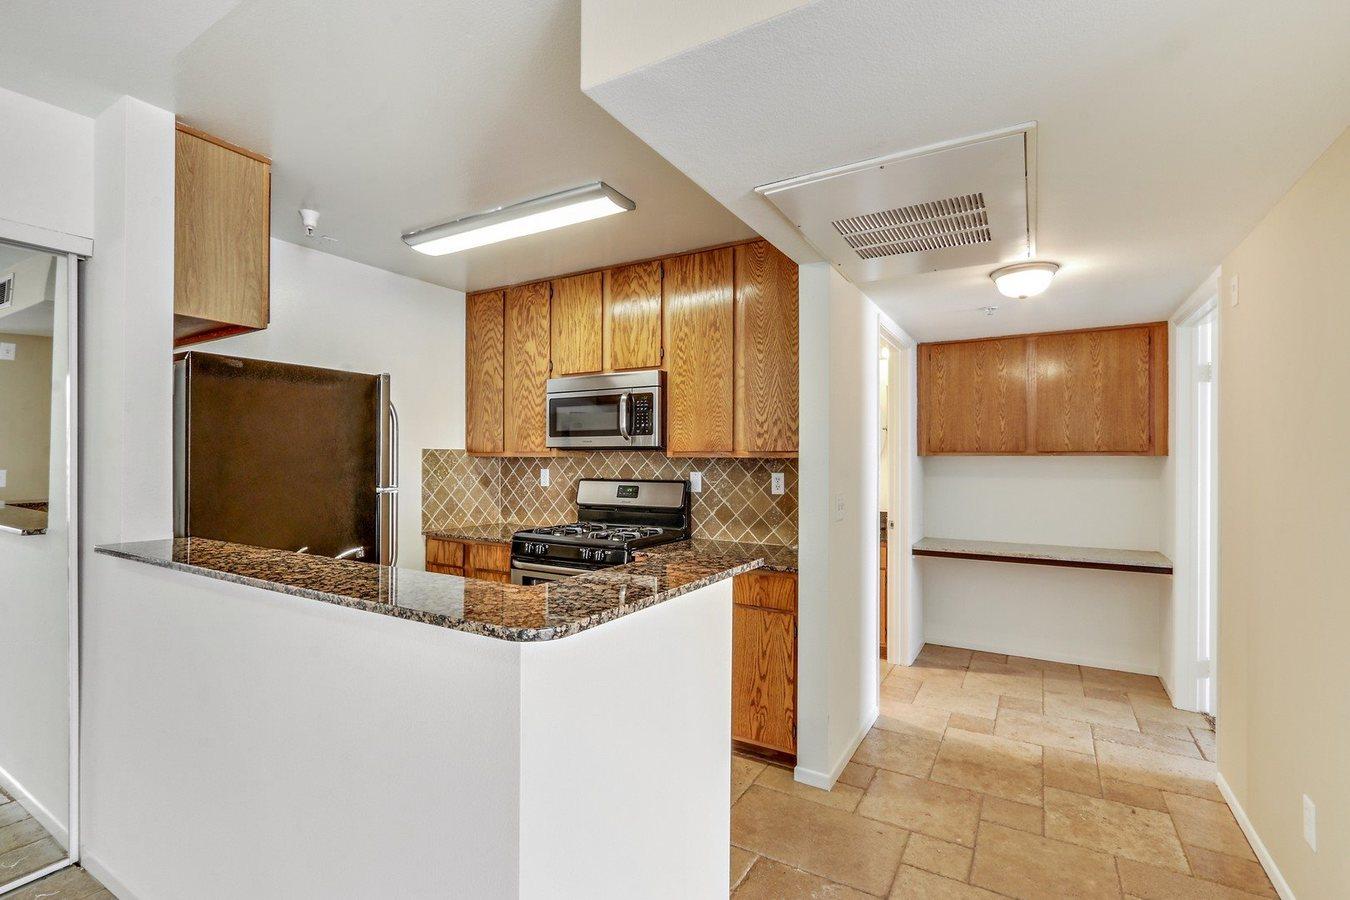 2 Bedrooms 2 Bathrooms Apartment for rent at Sophia Ridge in Reseda, CA